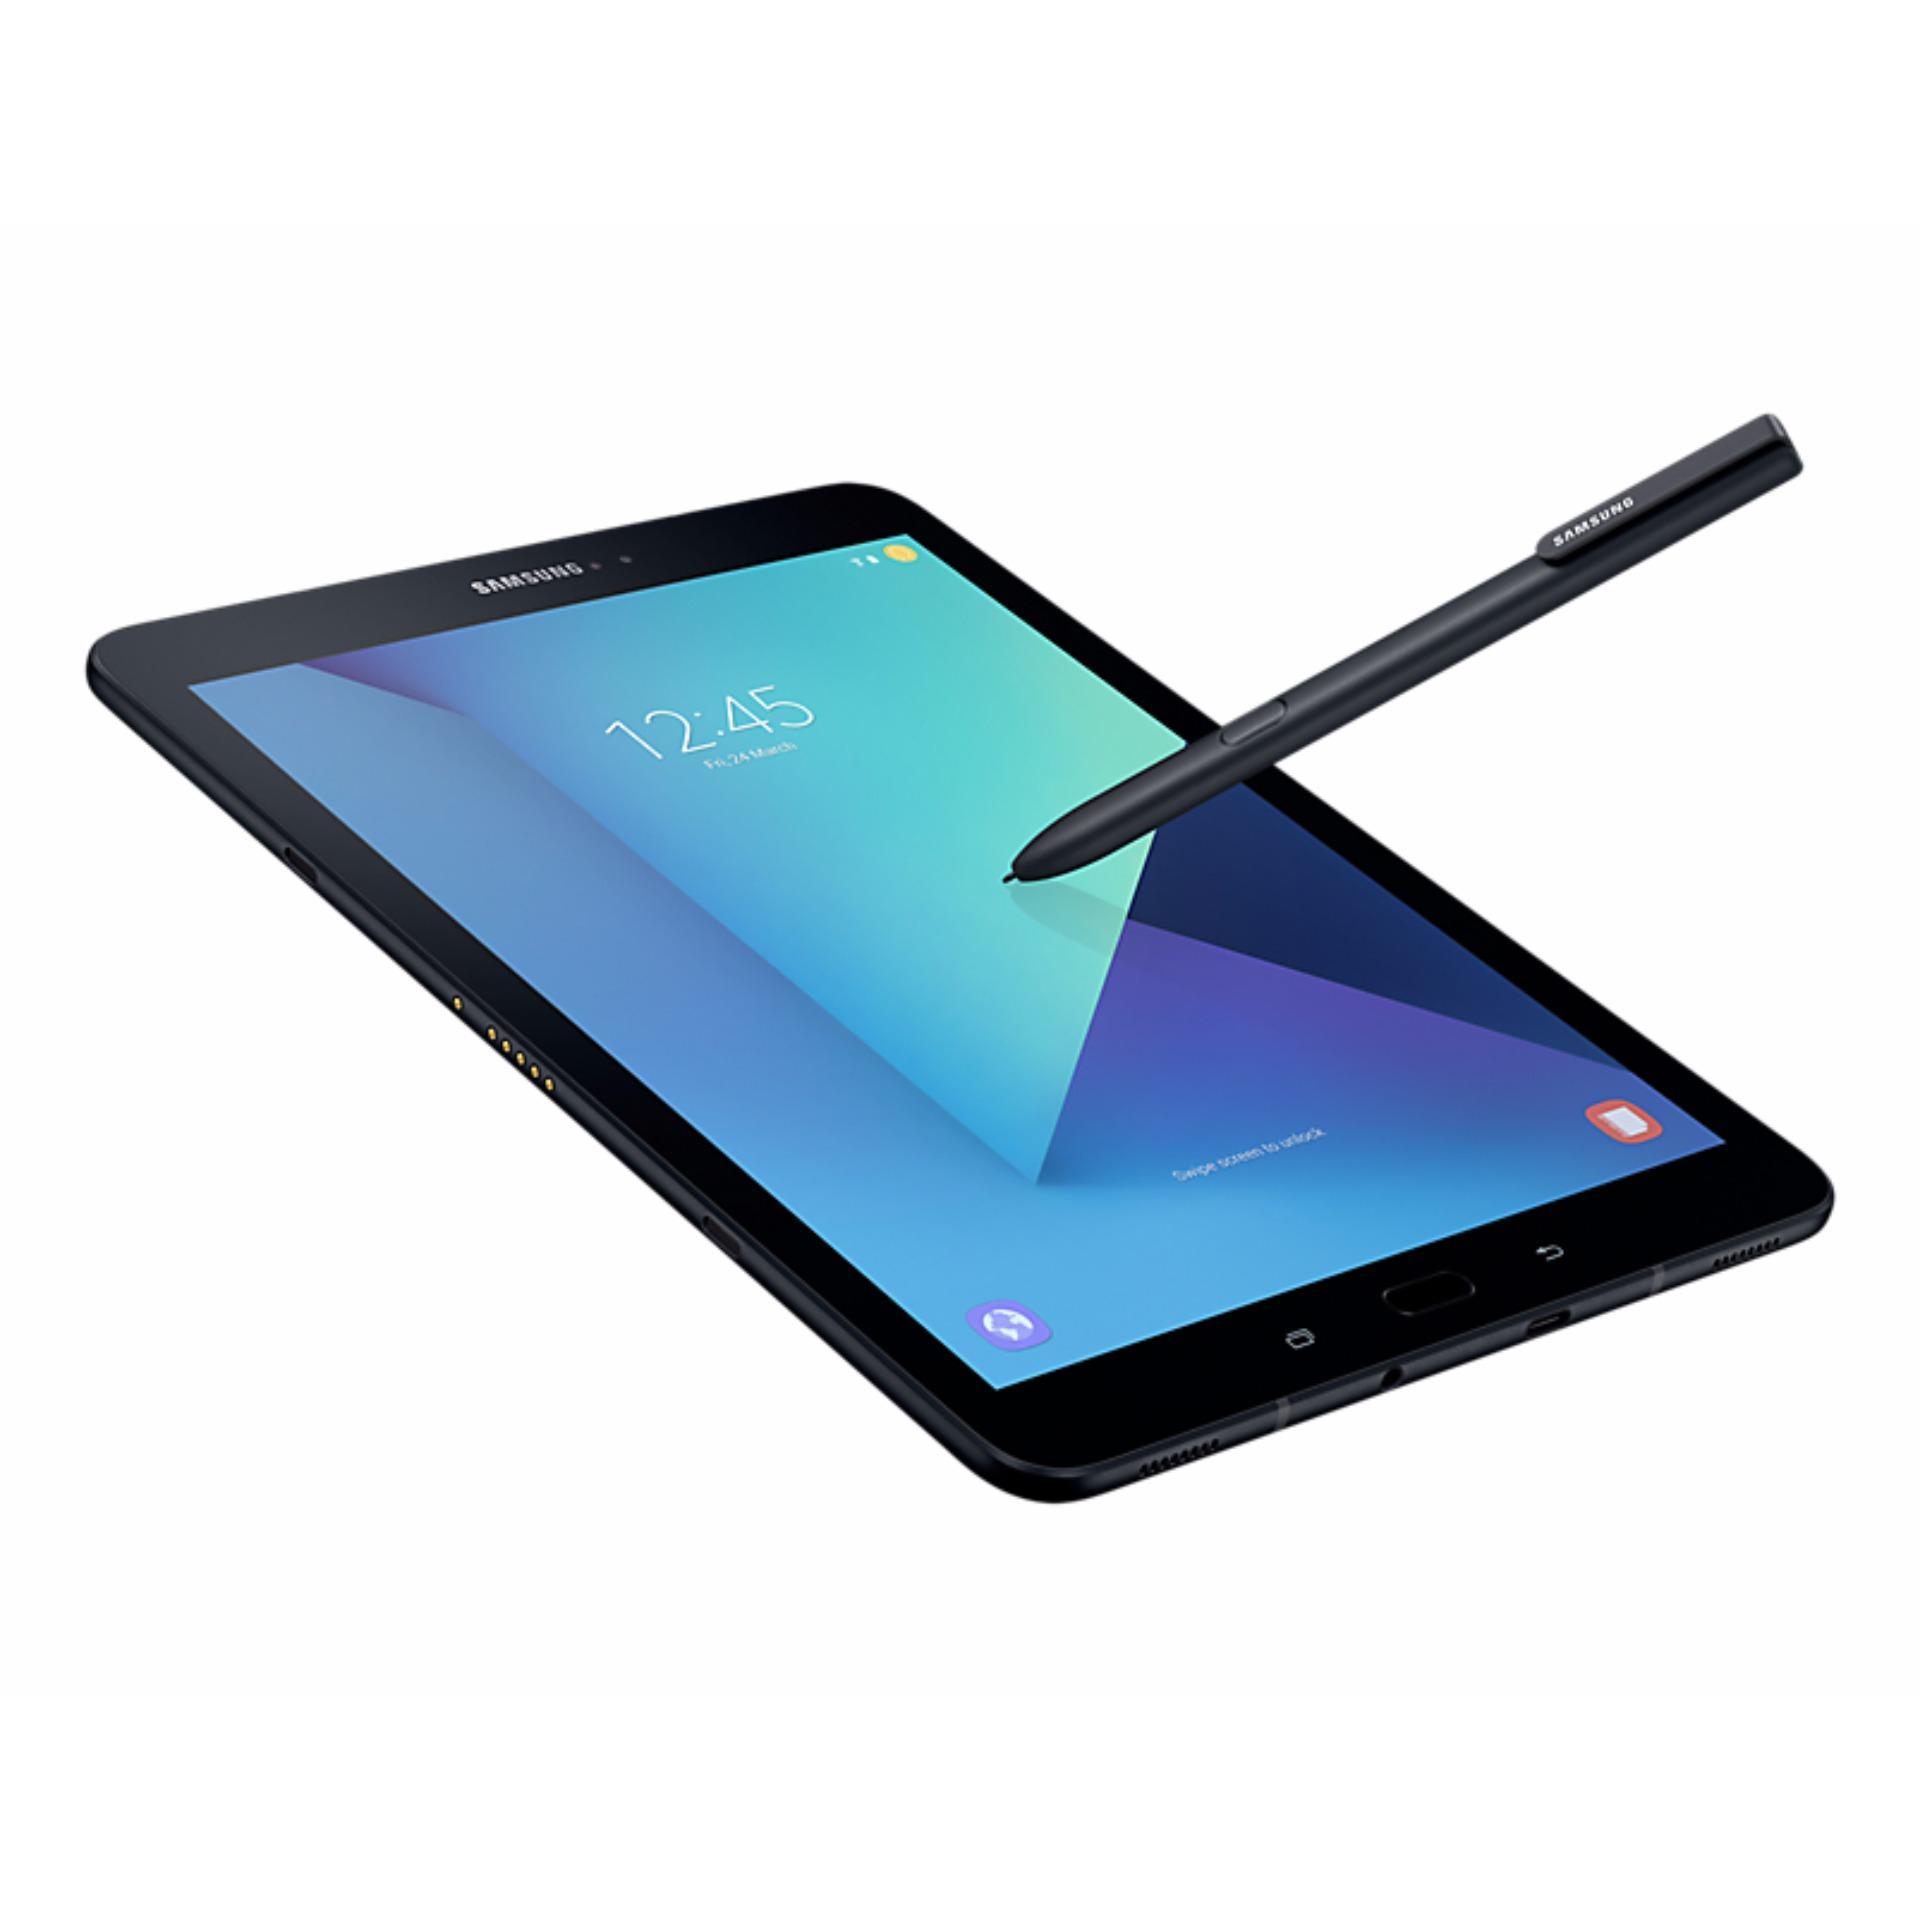 [NEW] Samsung Galaxy Tab S3 WIFI with S-Pen (BLACK)